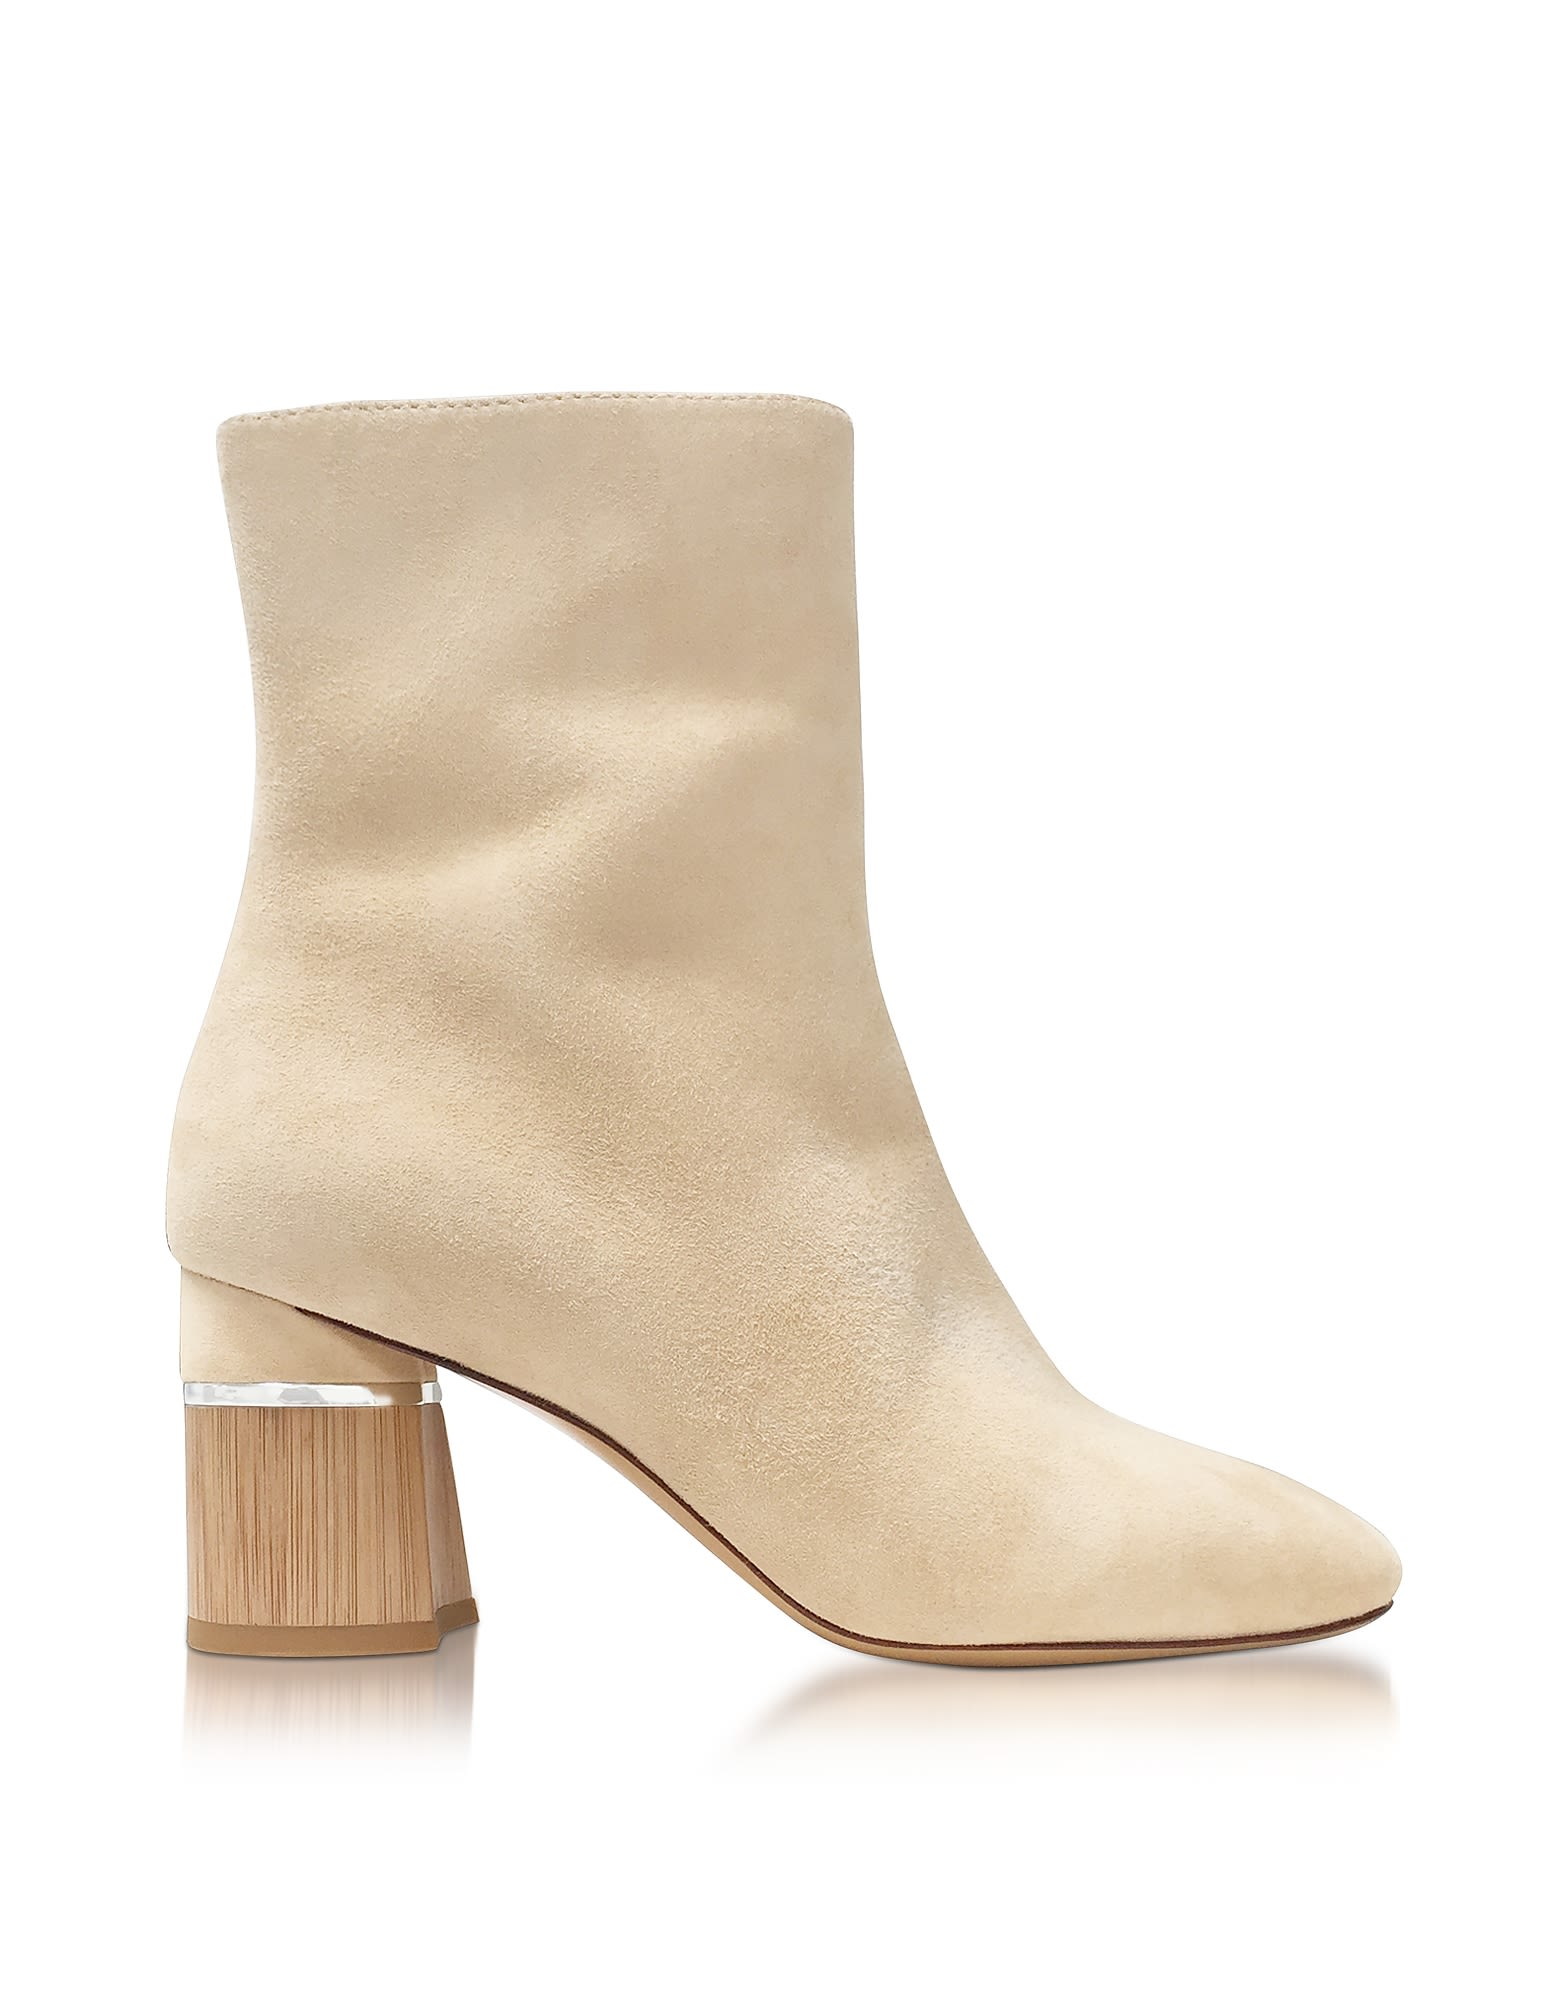 3.1 Phillip Lim Drum Ecru Suede Heel Ankle Boots 10591011